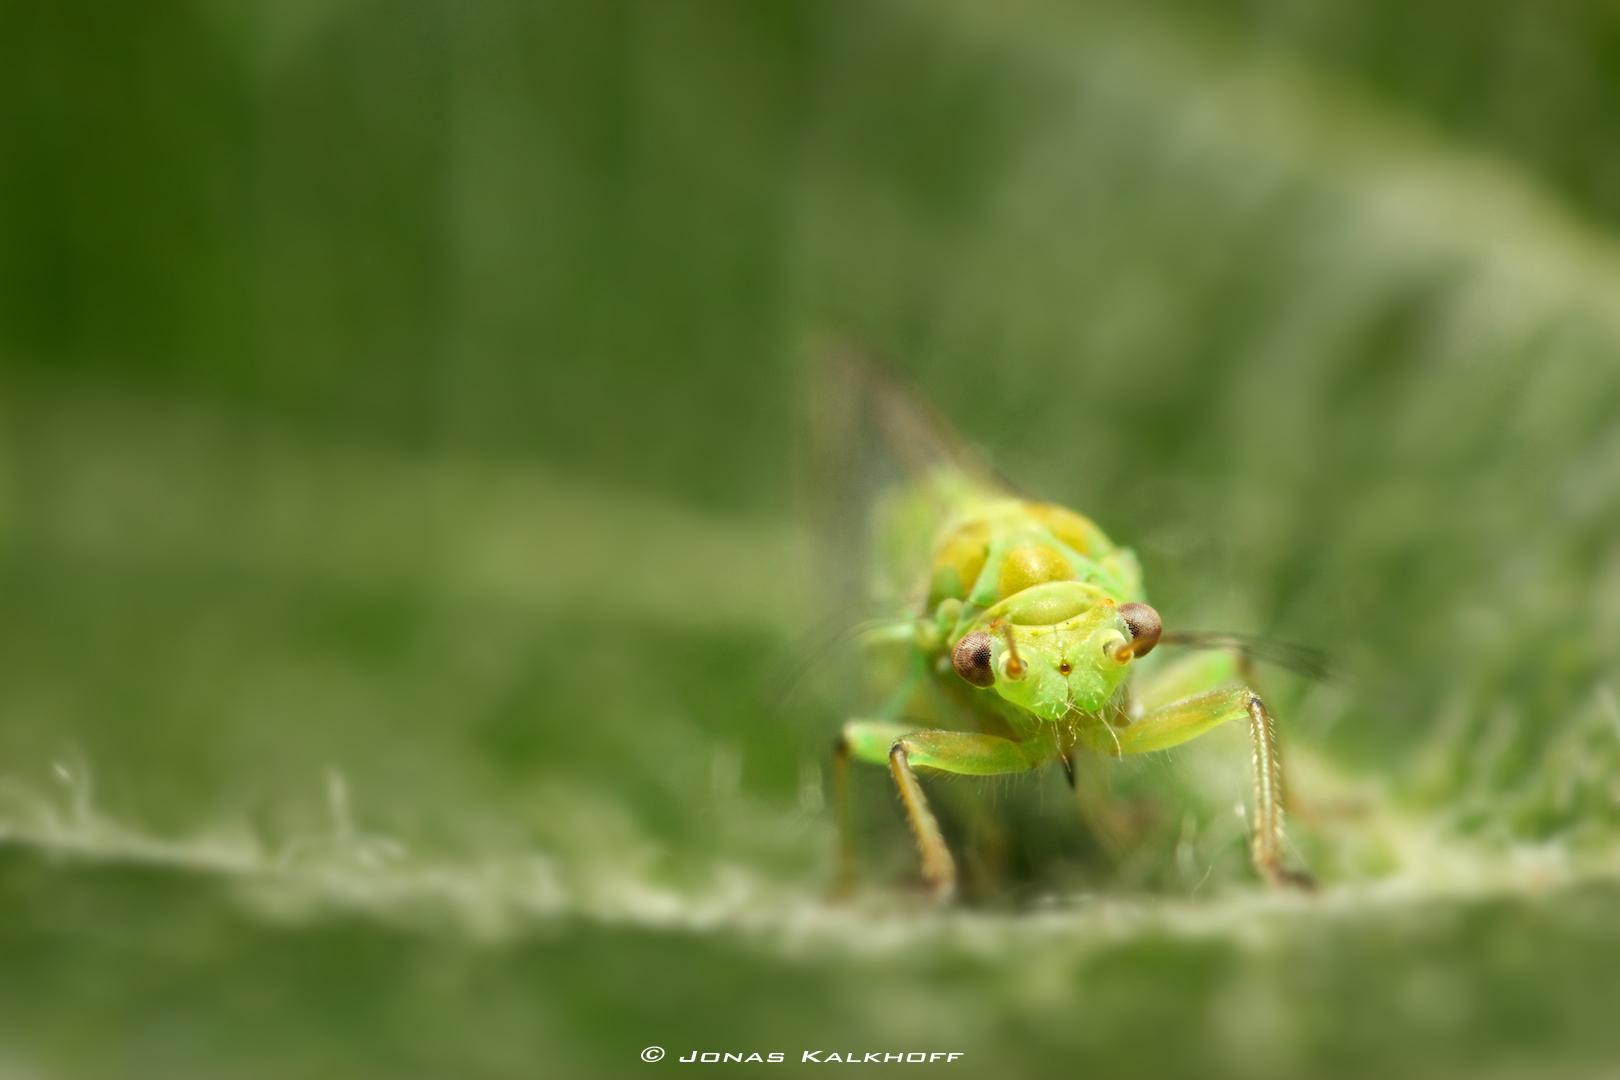 kleines grünes dings